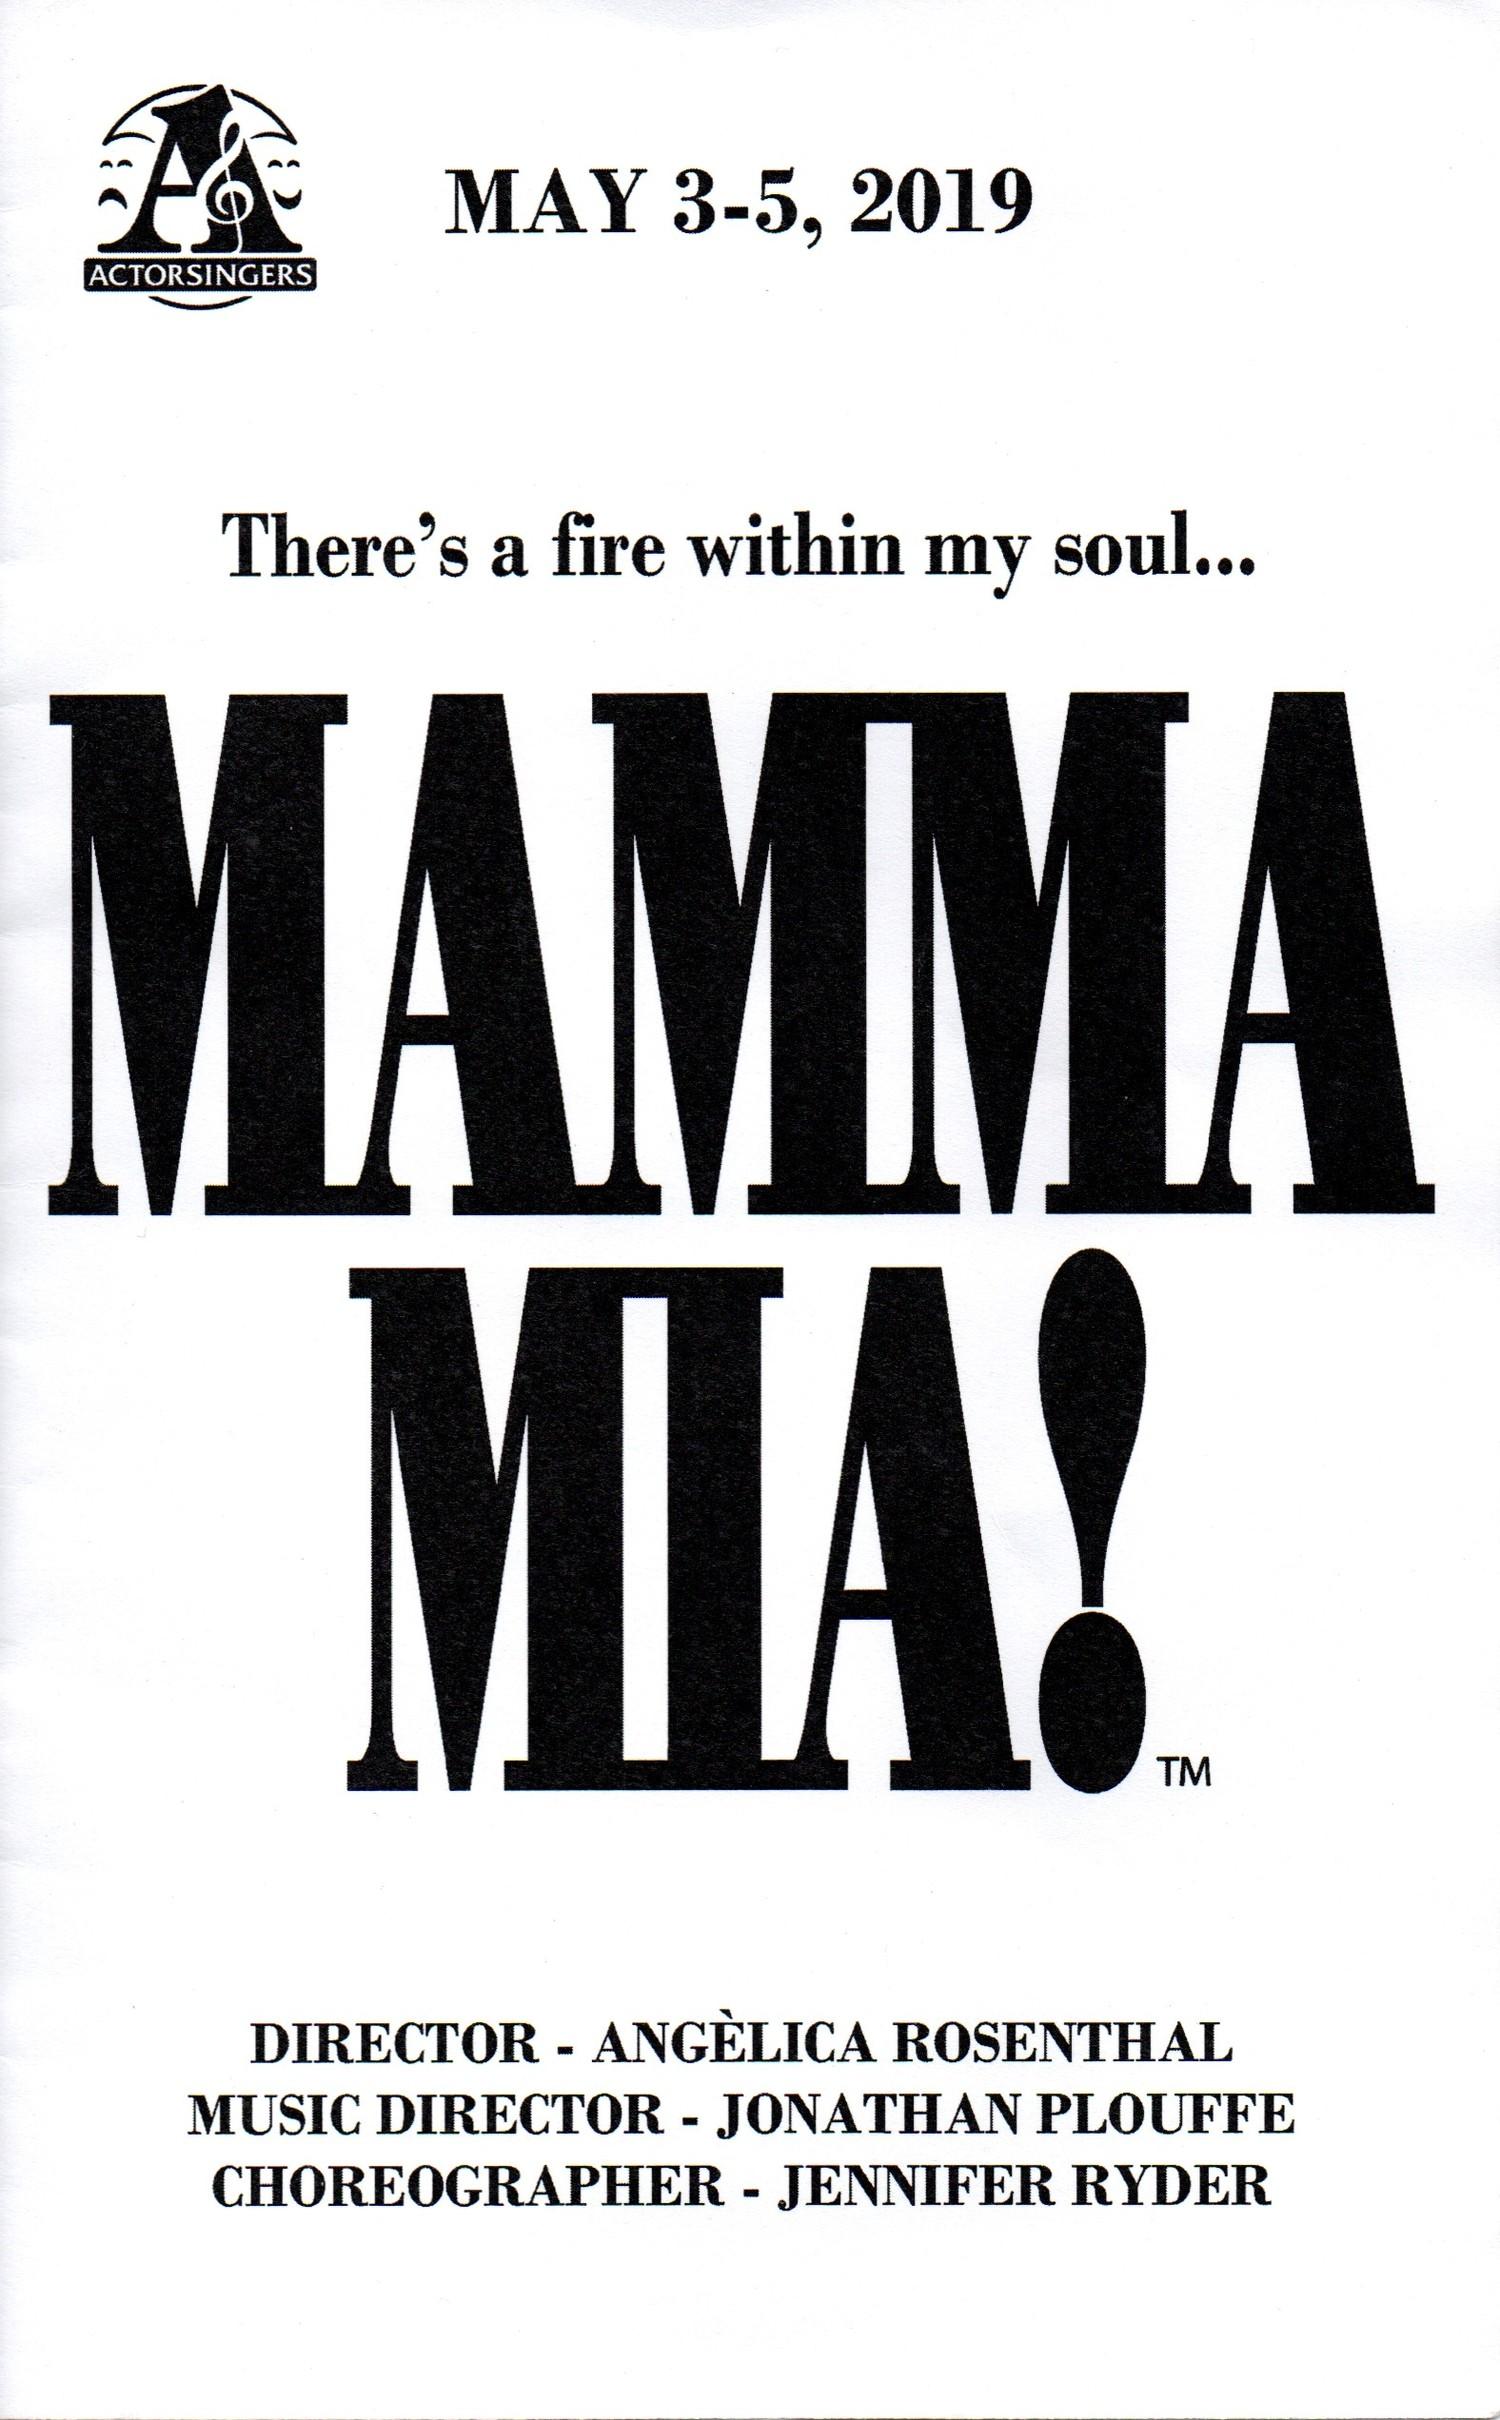 BWW Review: Celebrating Big with MAMMA MIA at Actorsingers